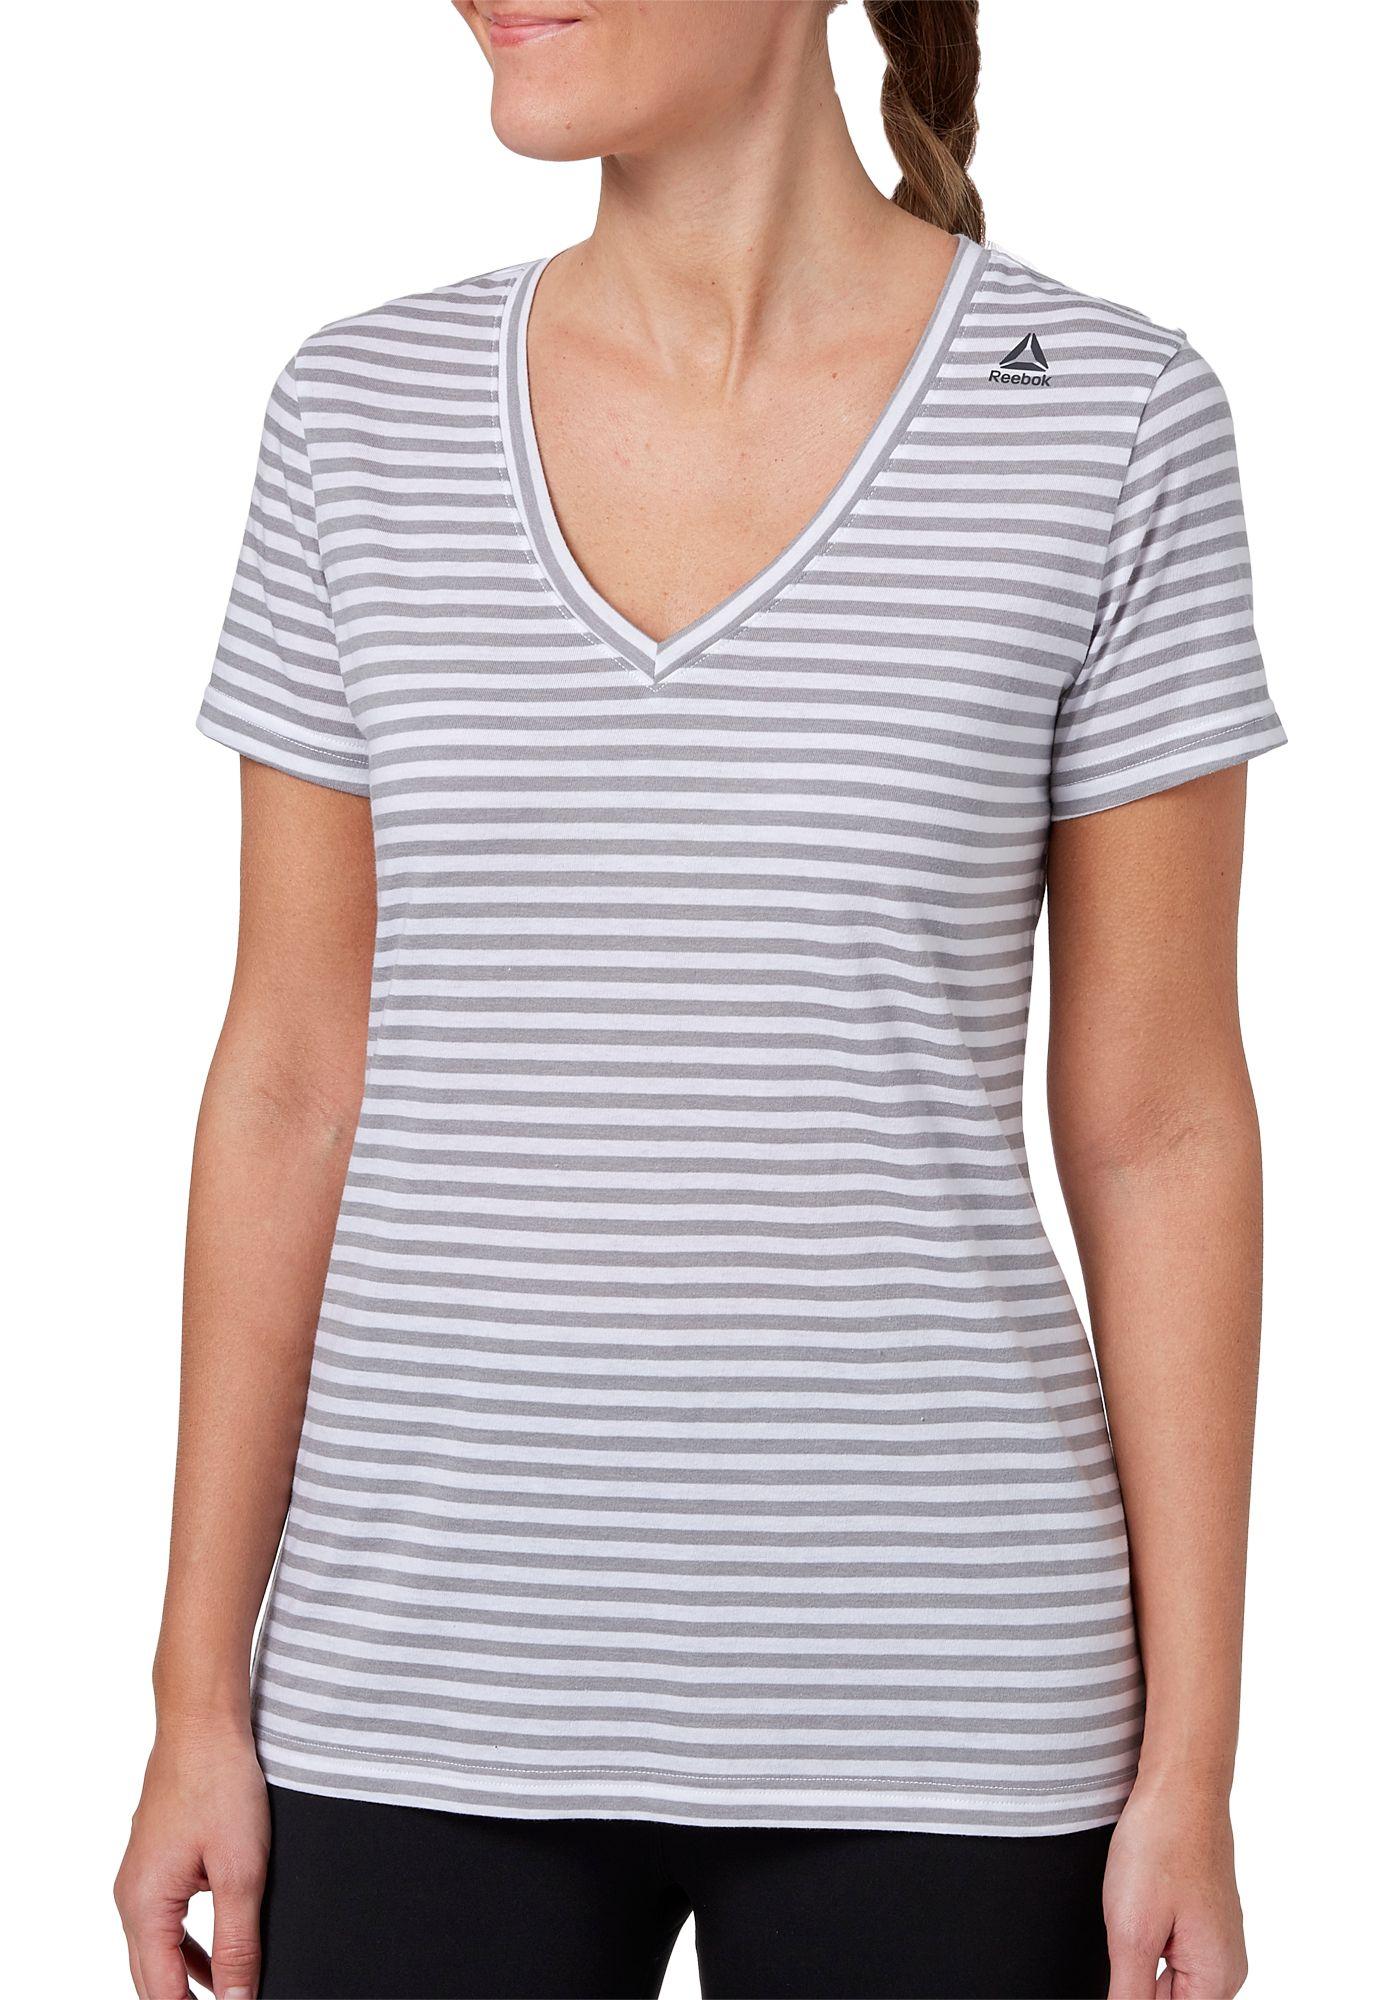 Reebok Women's V-Neck T-Shirt